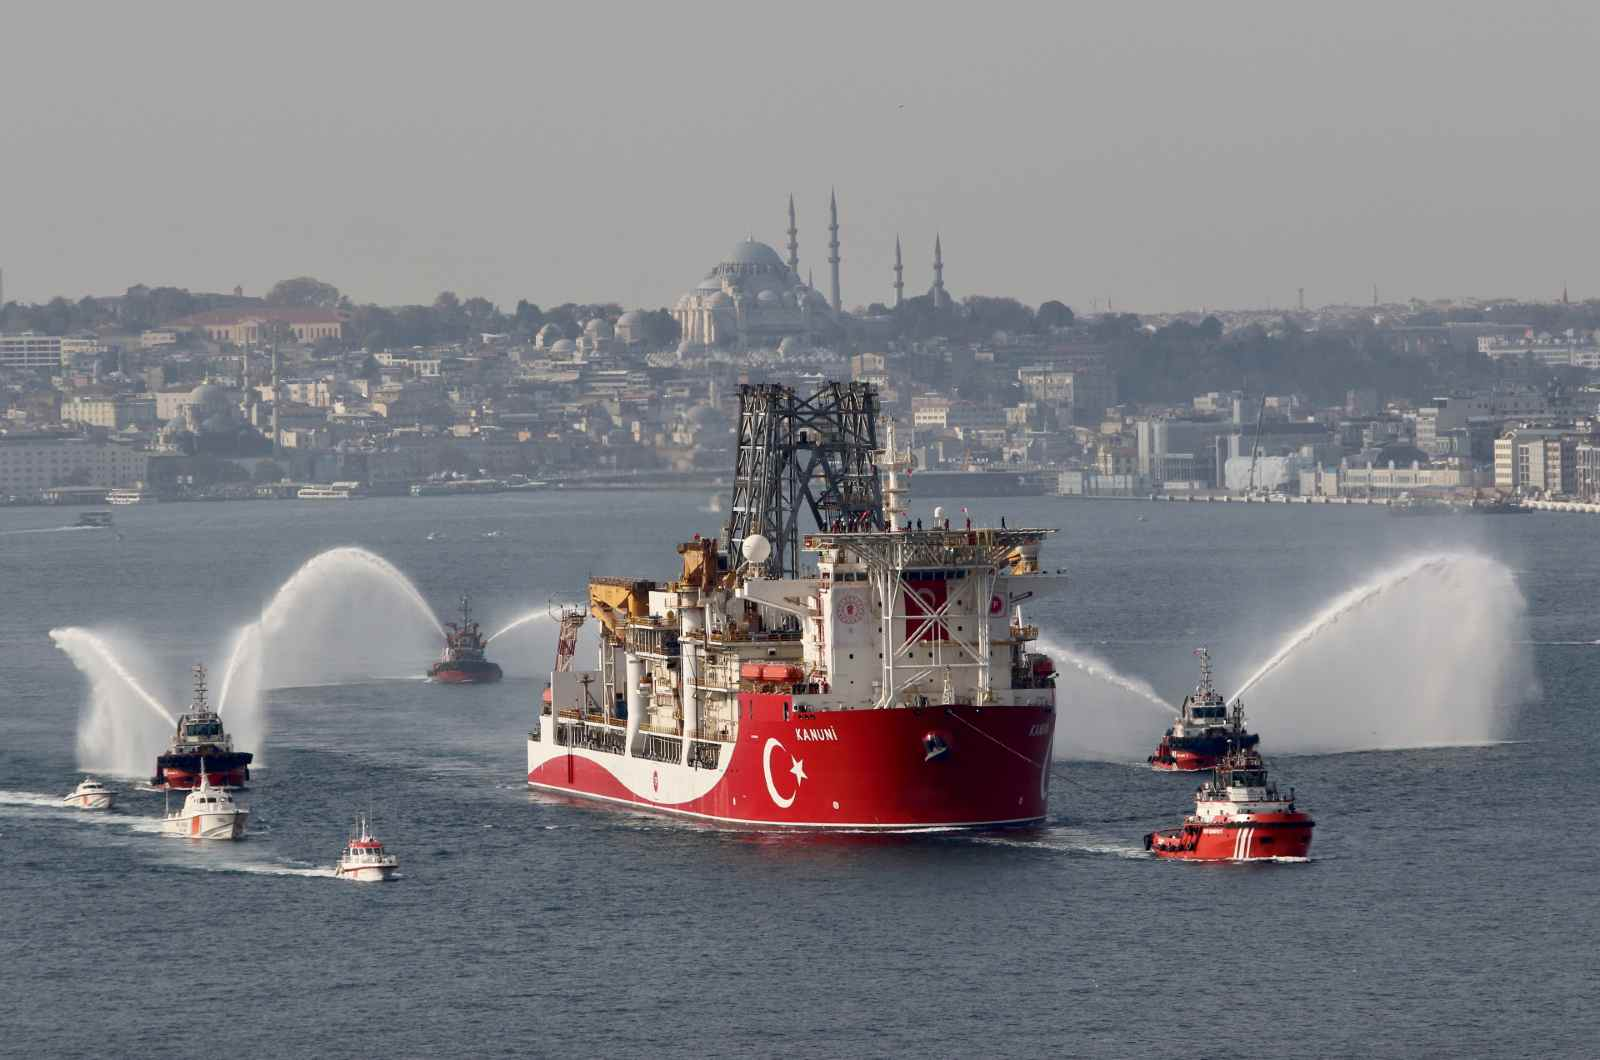 Turkey's drilling vessel Kanuni departs on her maiden trip to the Black Sea in Istanbul, Turkey November 13, 2020. REUTERS/Yoruk Isik